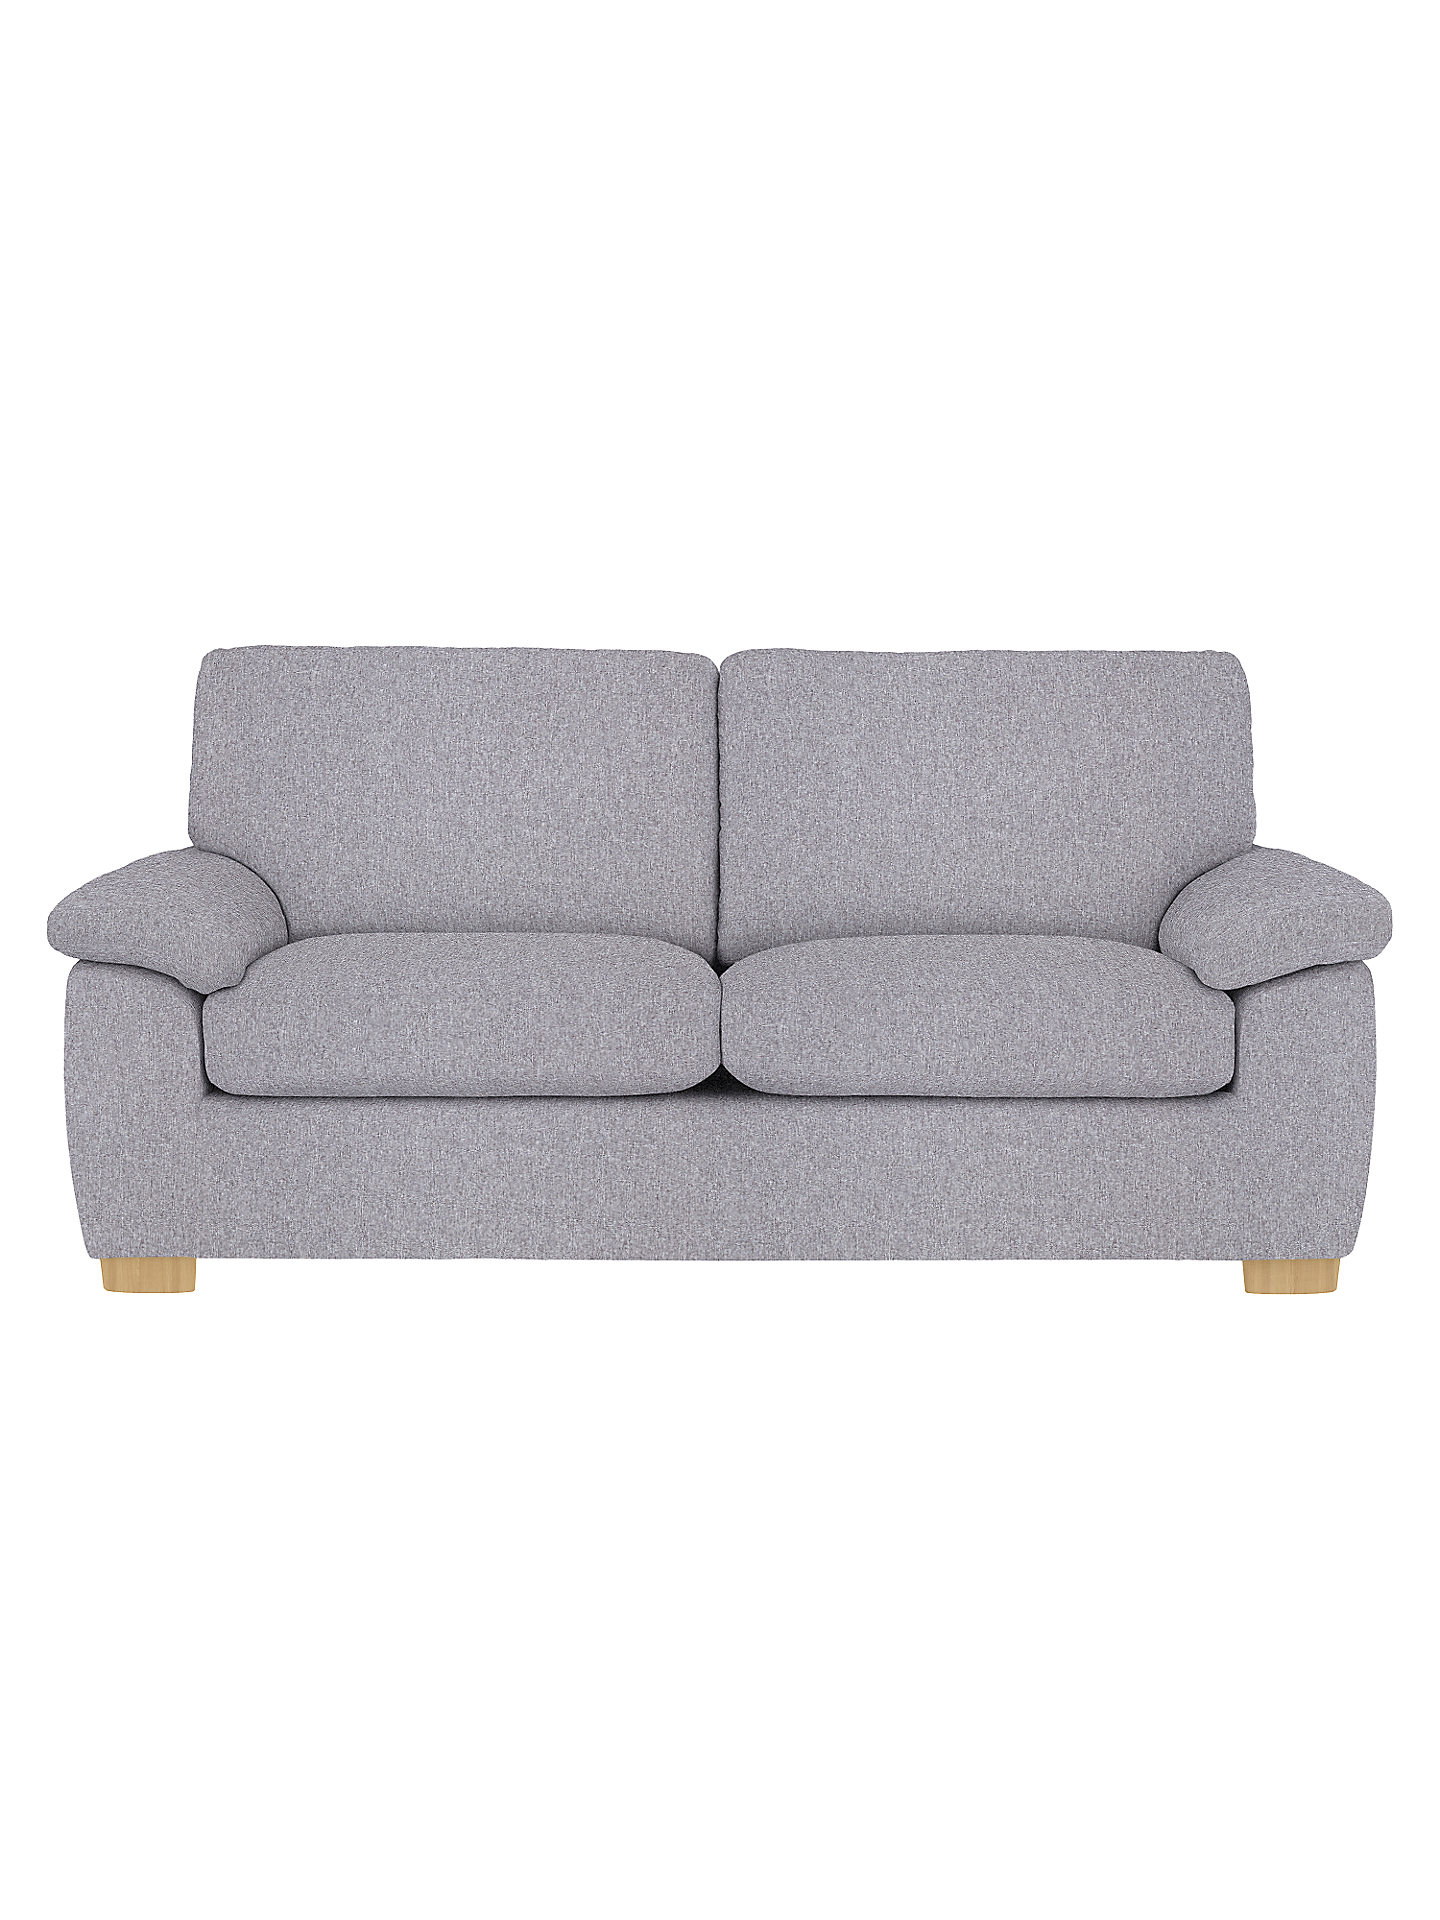 Buy John Lewis & Partners Camden Large 3 Seater Sofa Online at johnlewis.com